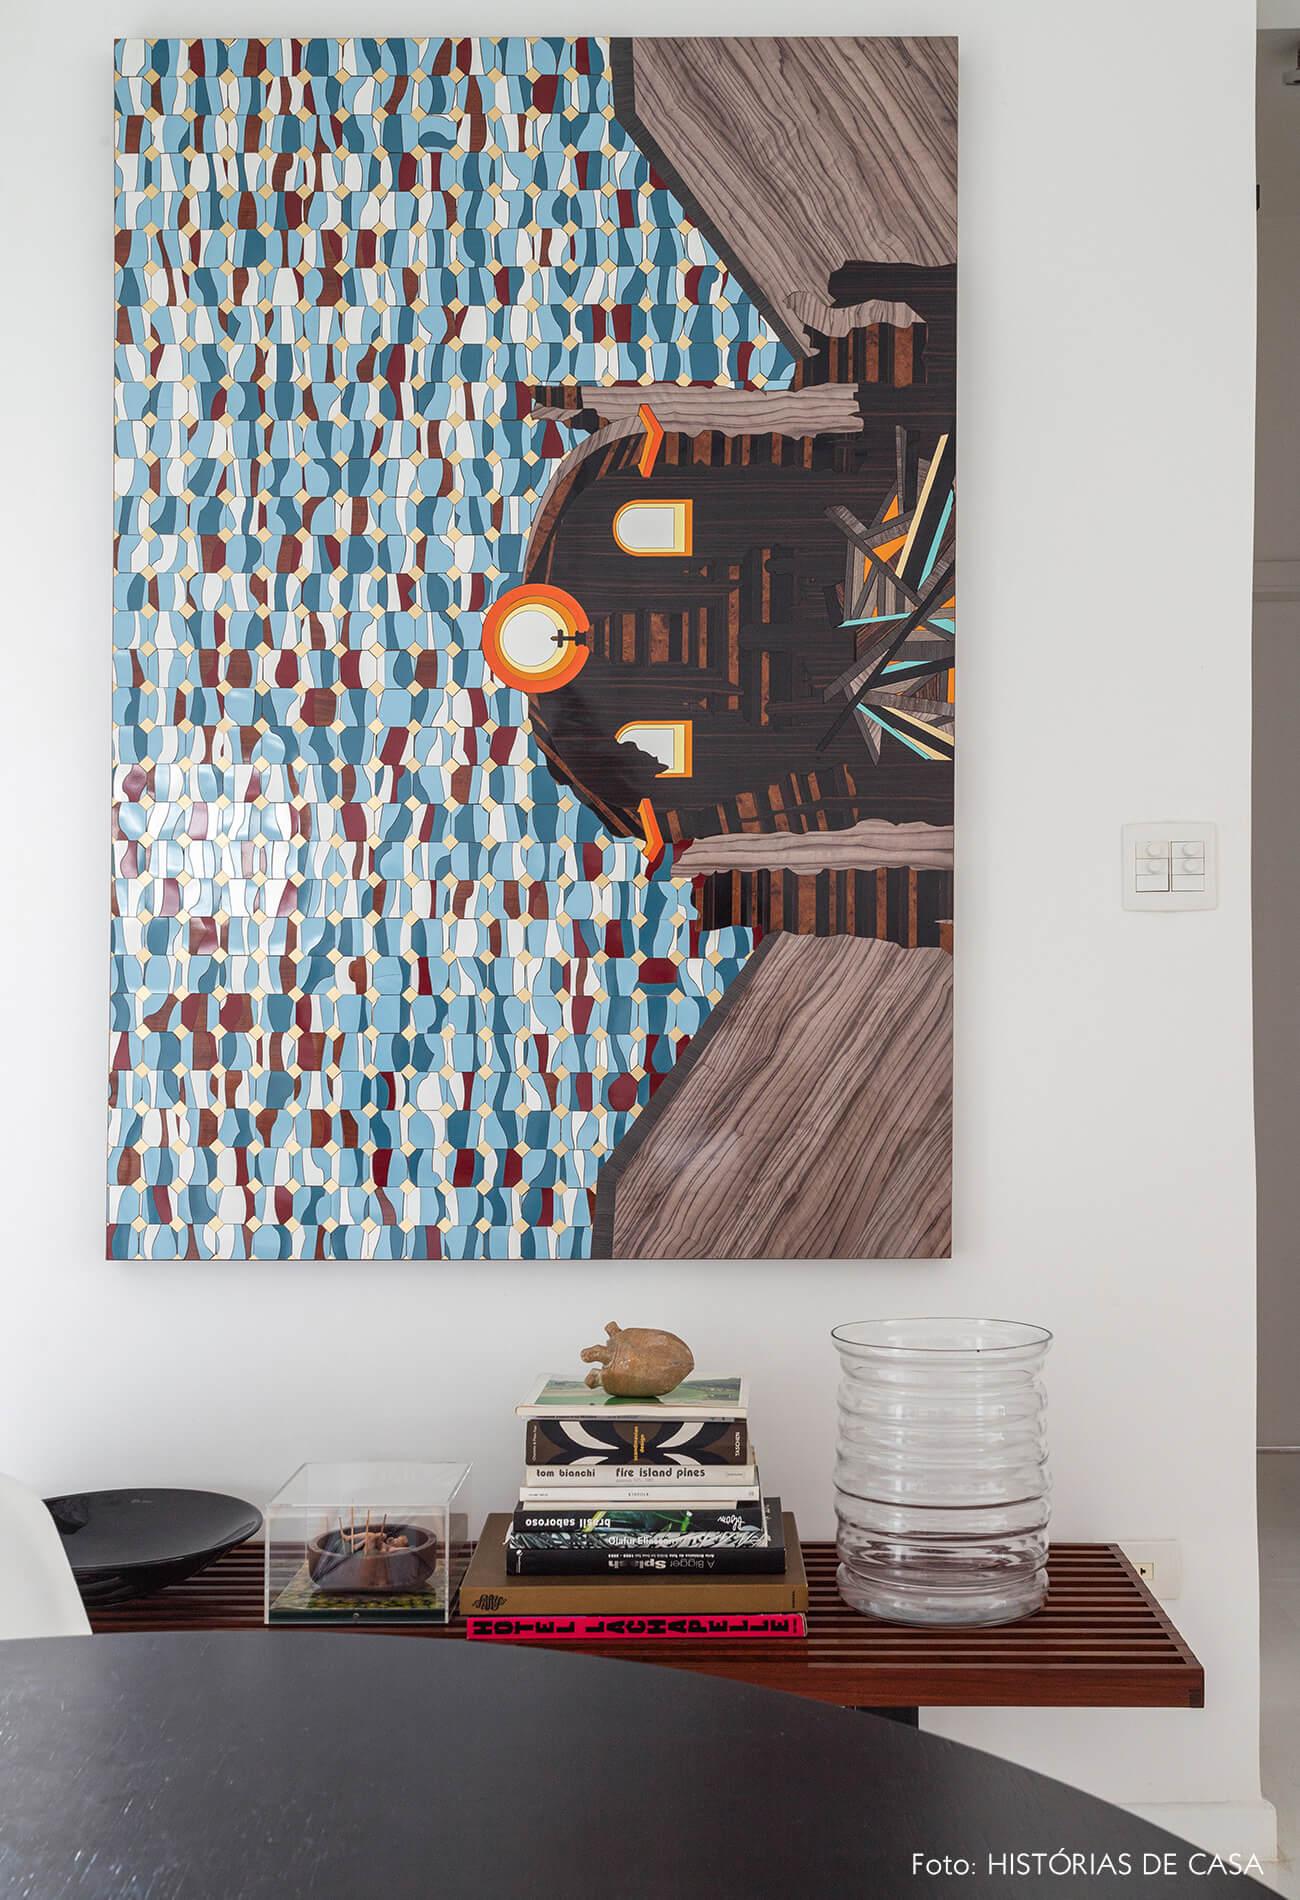 Apartamento escandinavo, banco de madeira